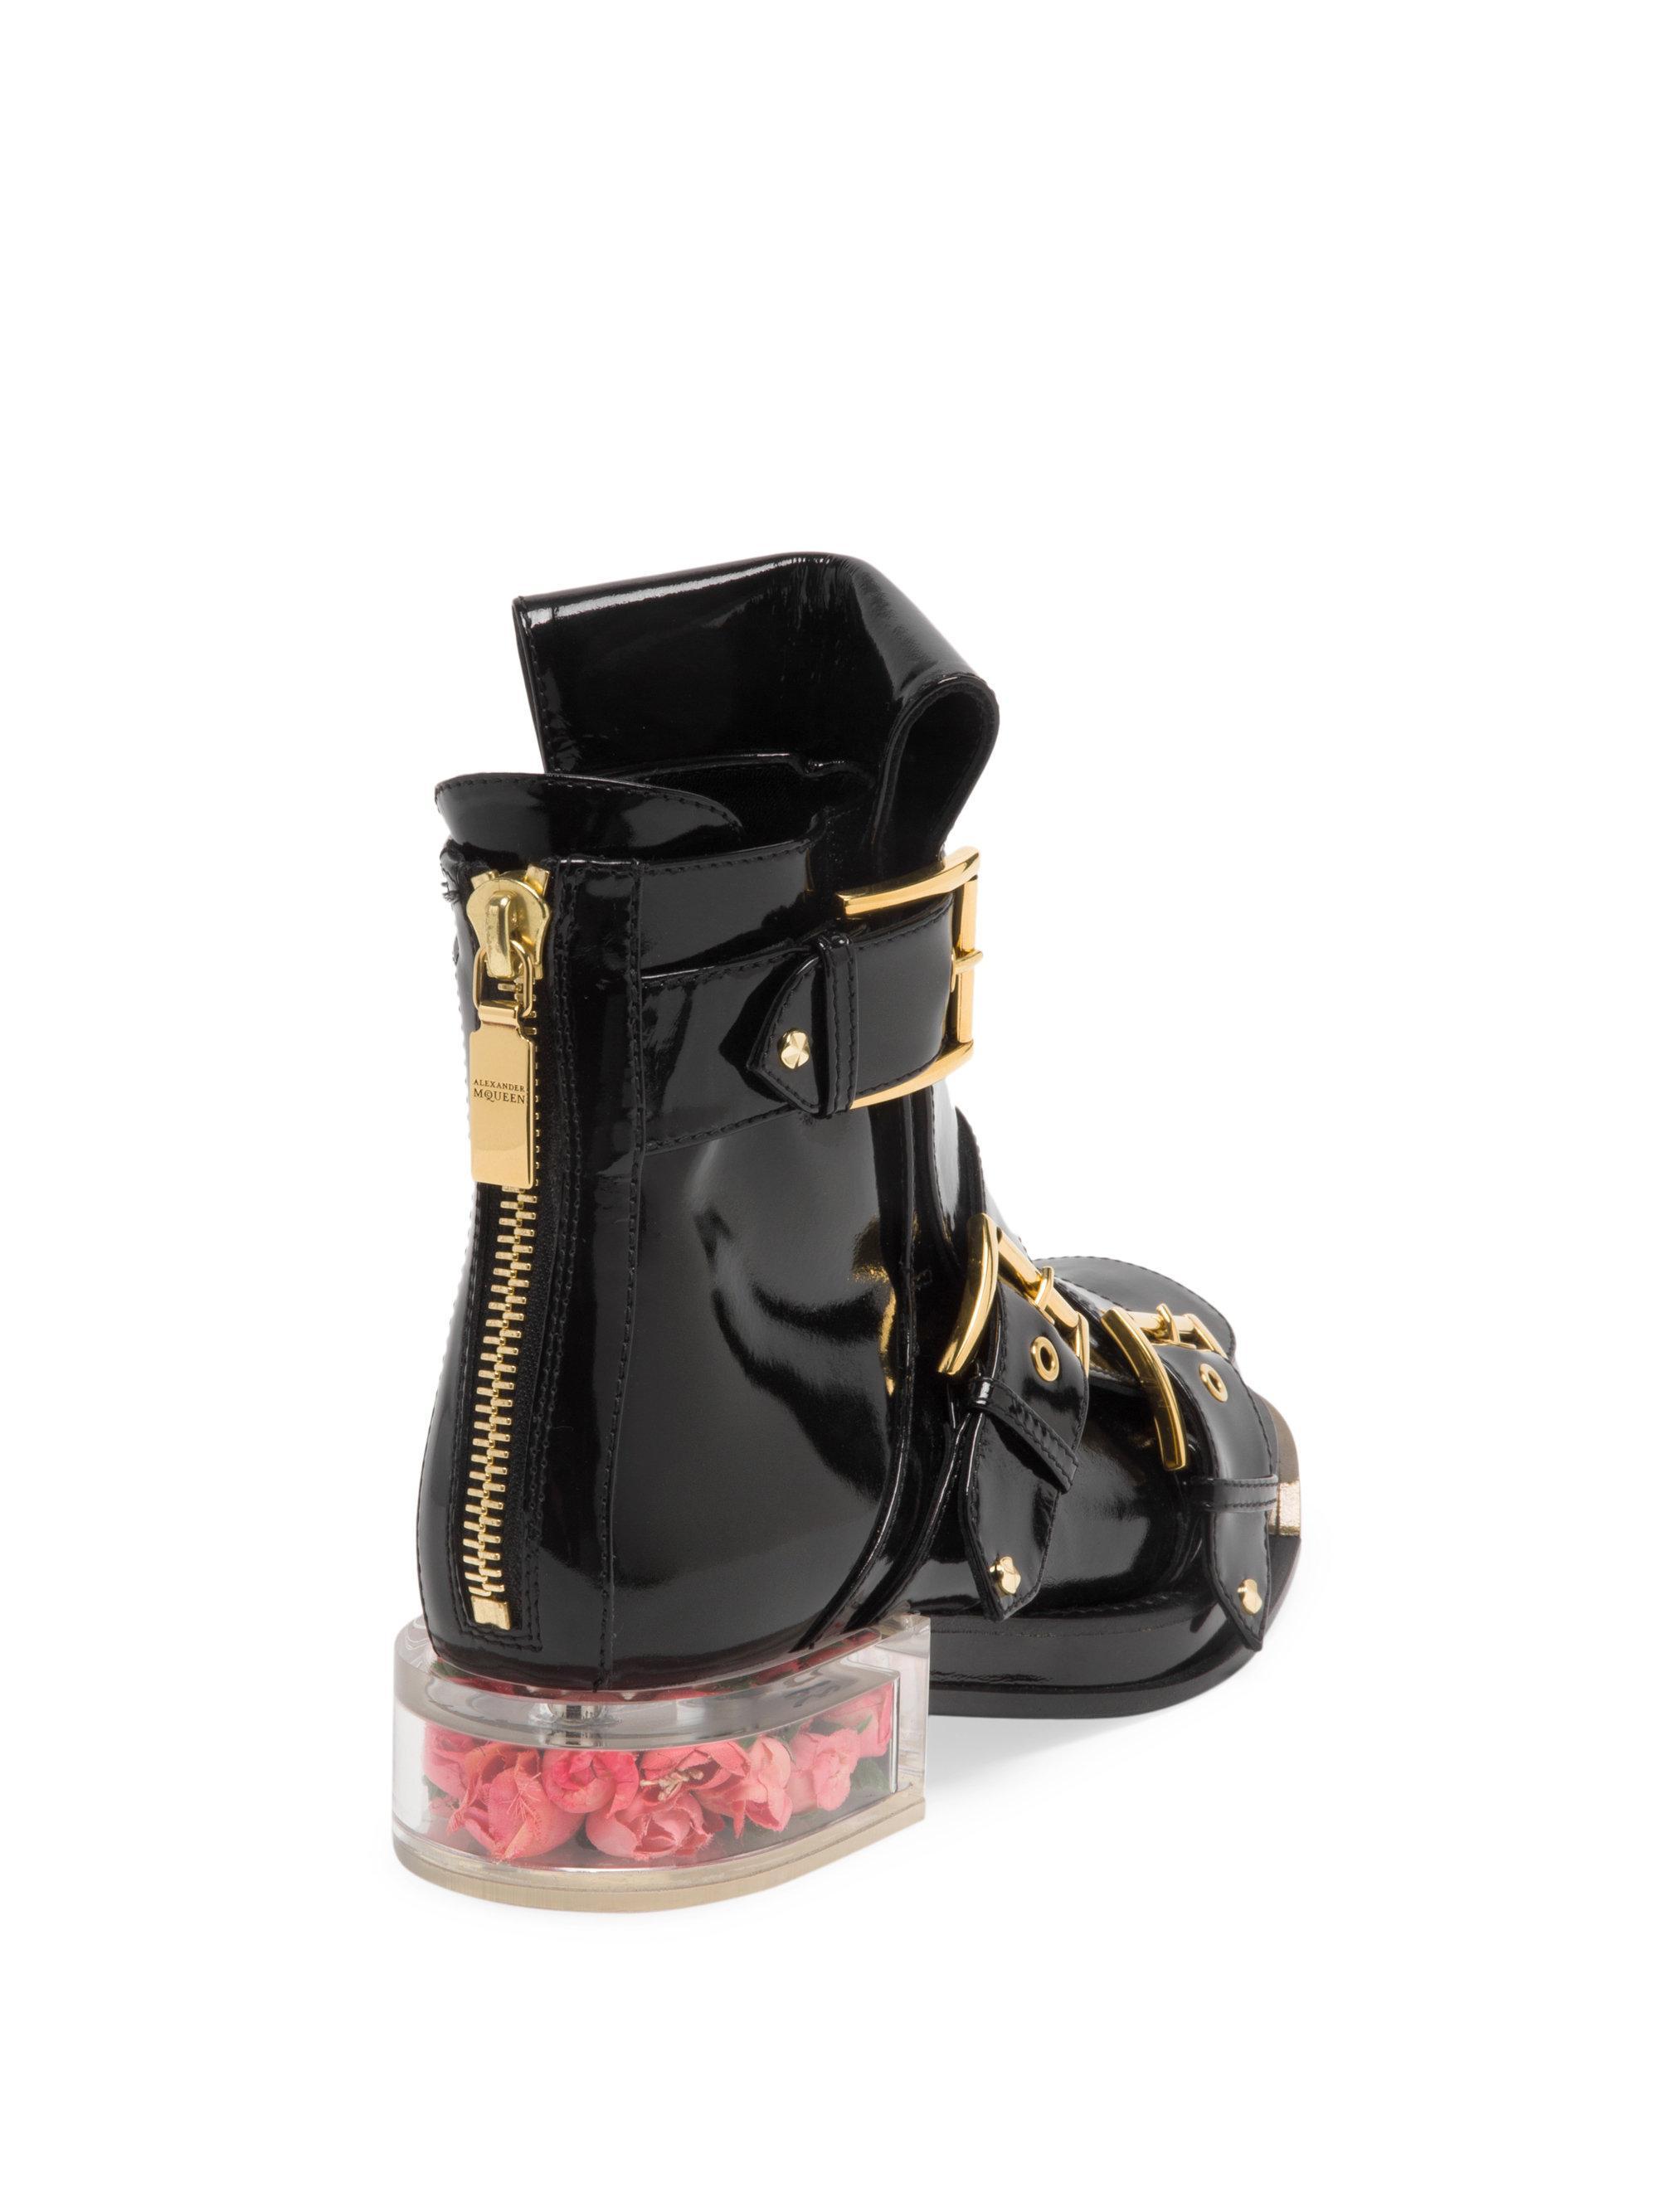 Alexander McQueenRose Bud Heel Patent Leather Boots Rk2uAVO9g